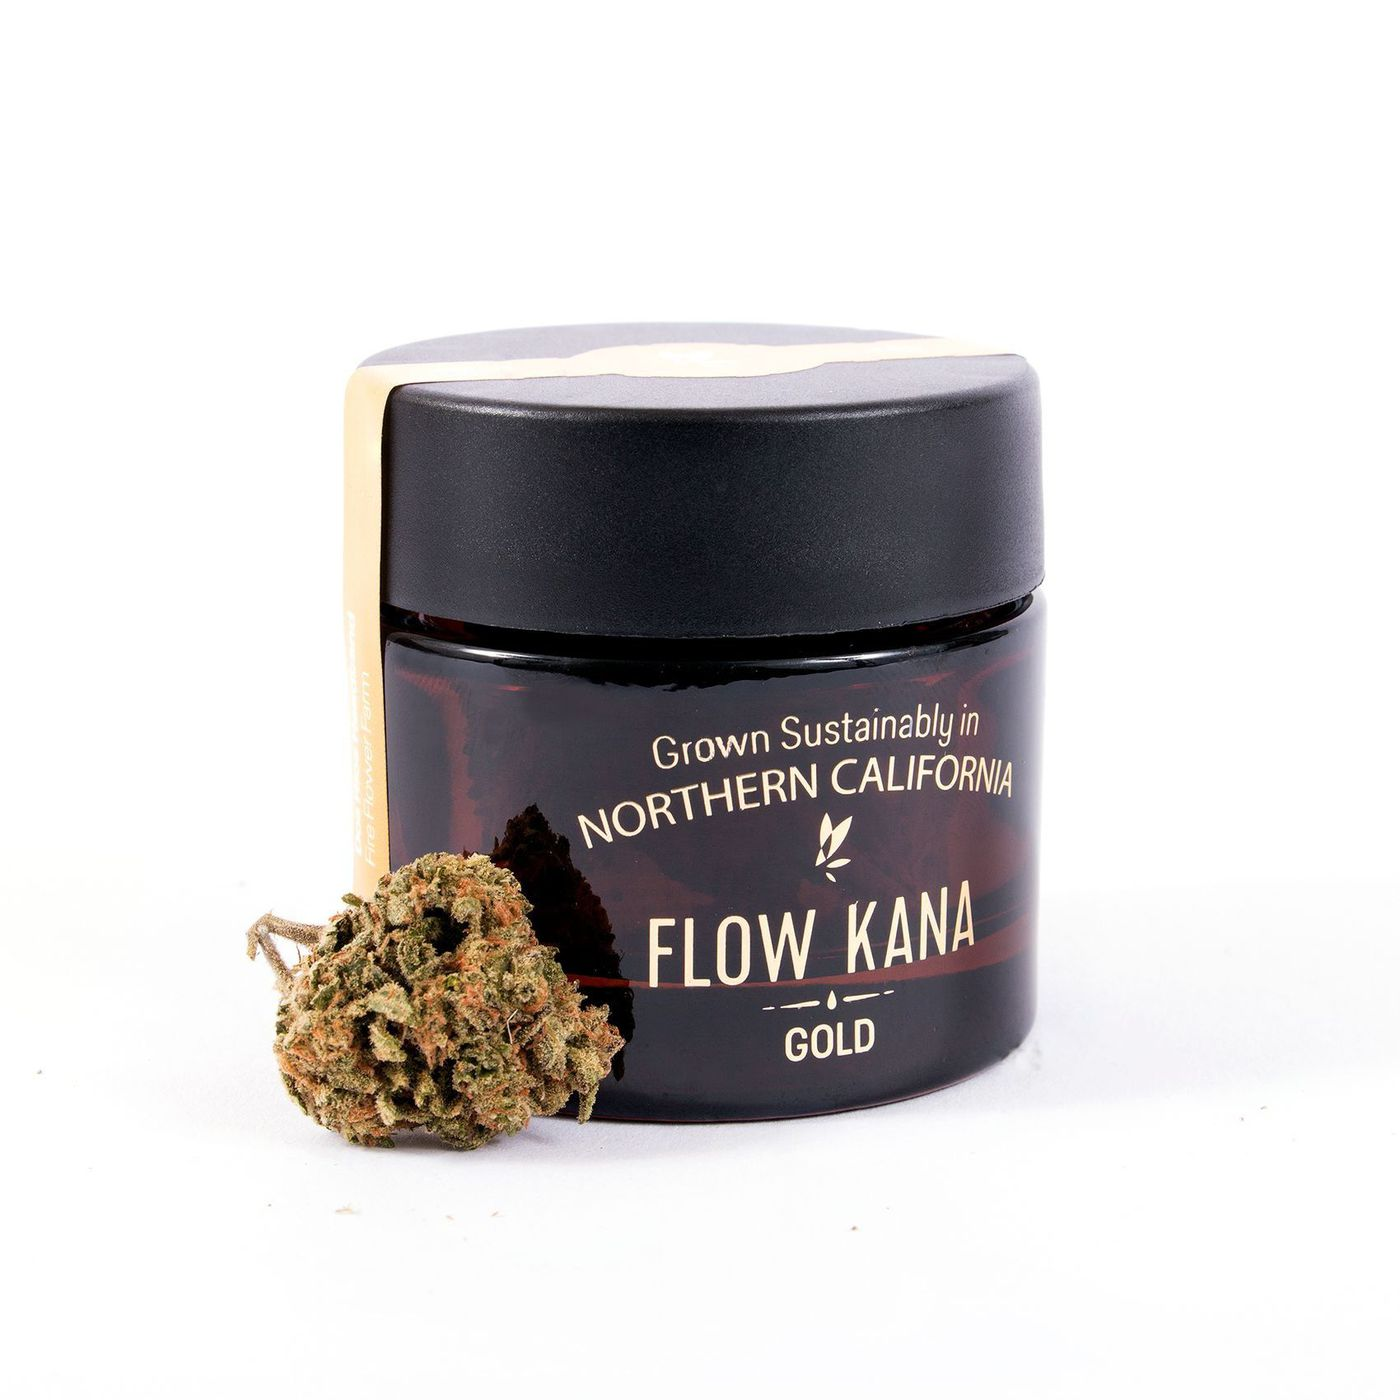 Flow Kana Elise McDonough for Leafly